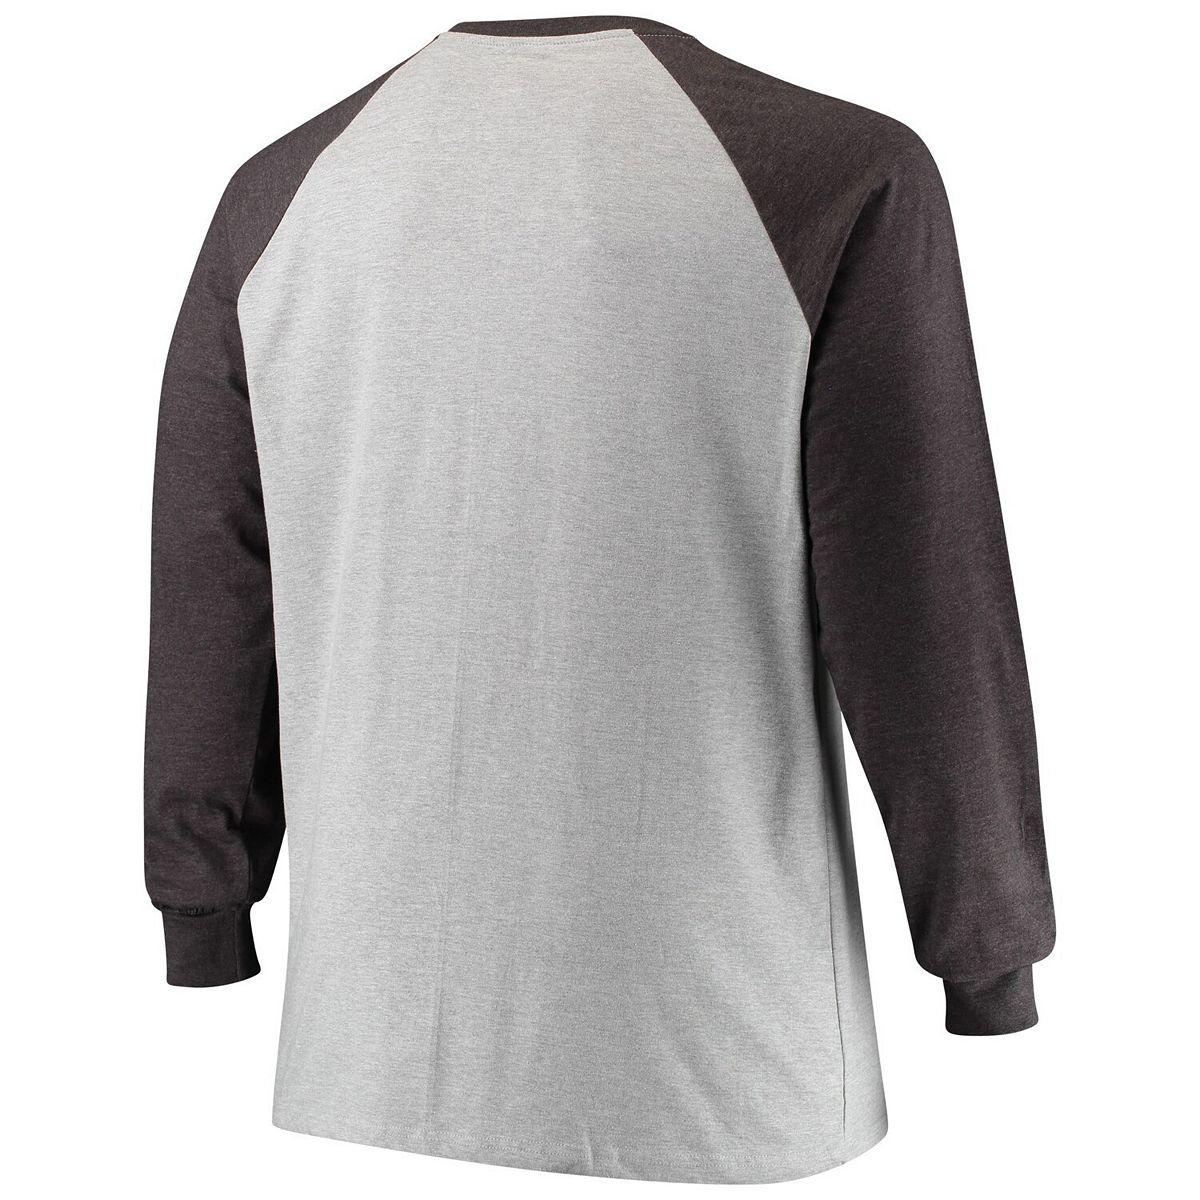 Men's Heathered Gray Philadelphia Eagles Big & Tall Contrast Raglan Long Sleeve T-Shirt iReP8